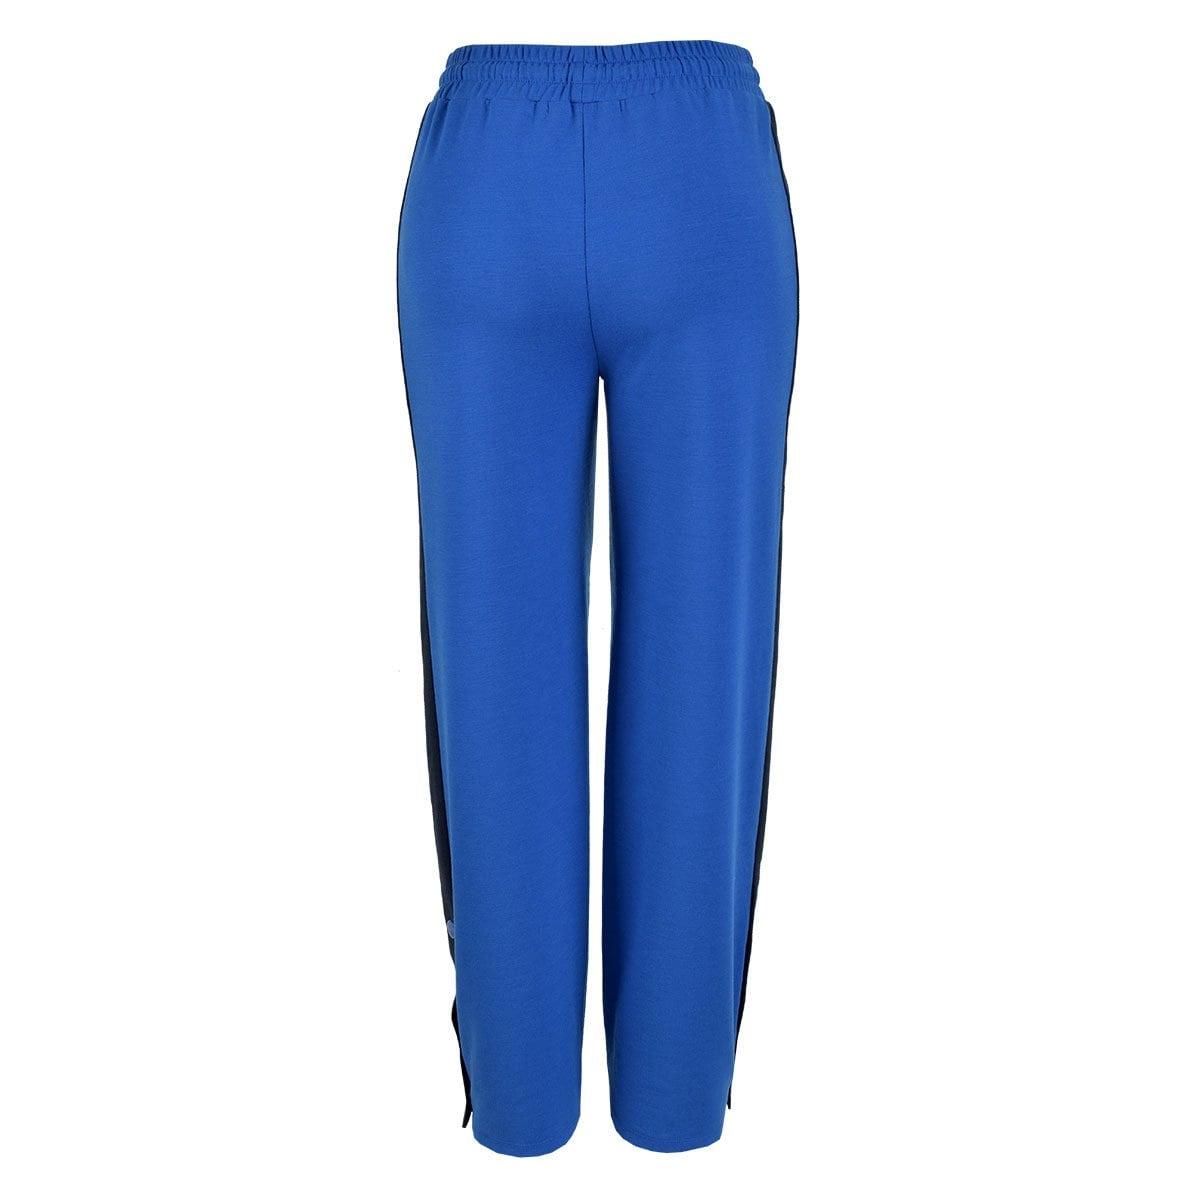 Pants Con Broches Laterales Fukka Para Dama